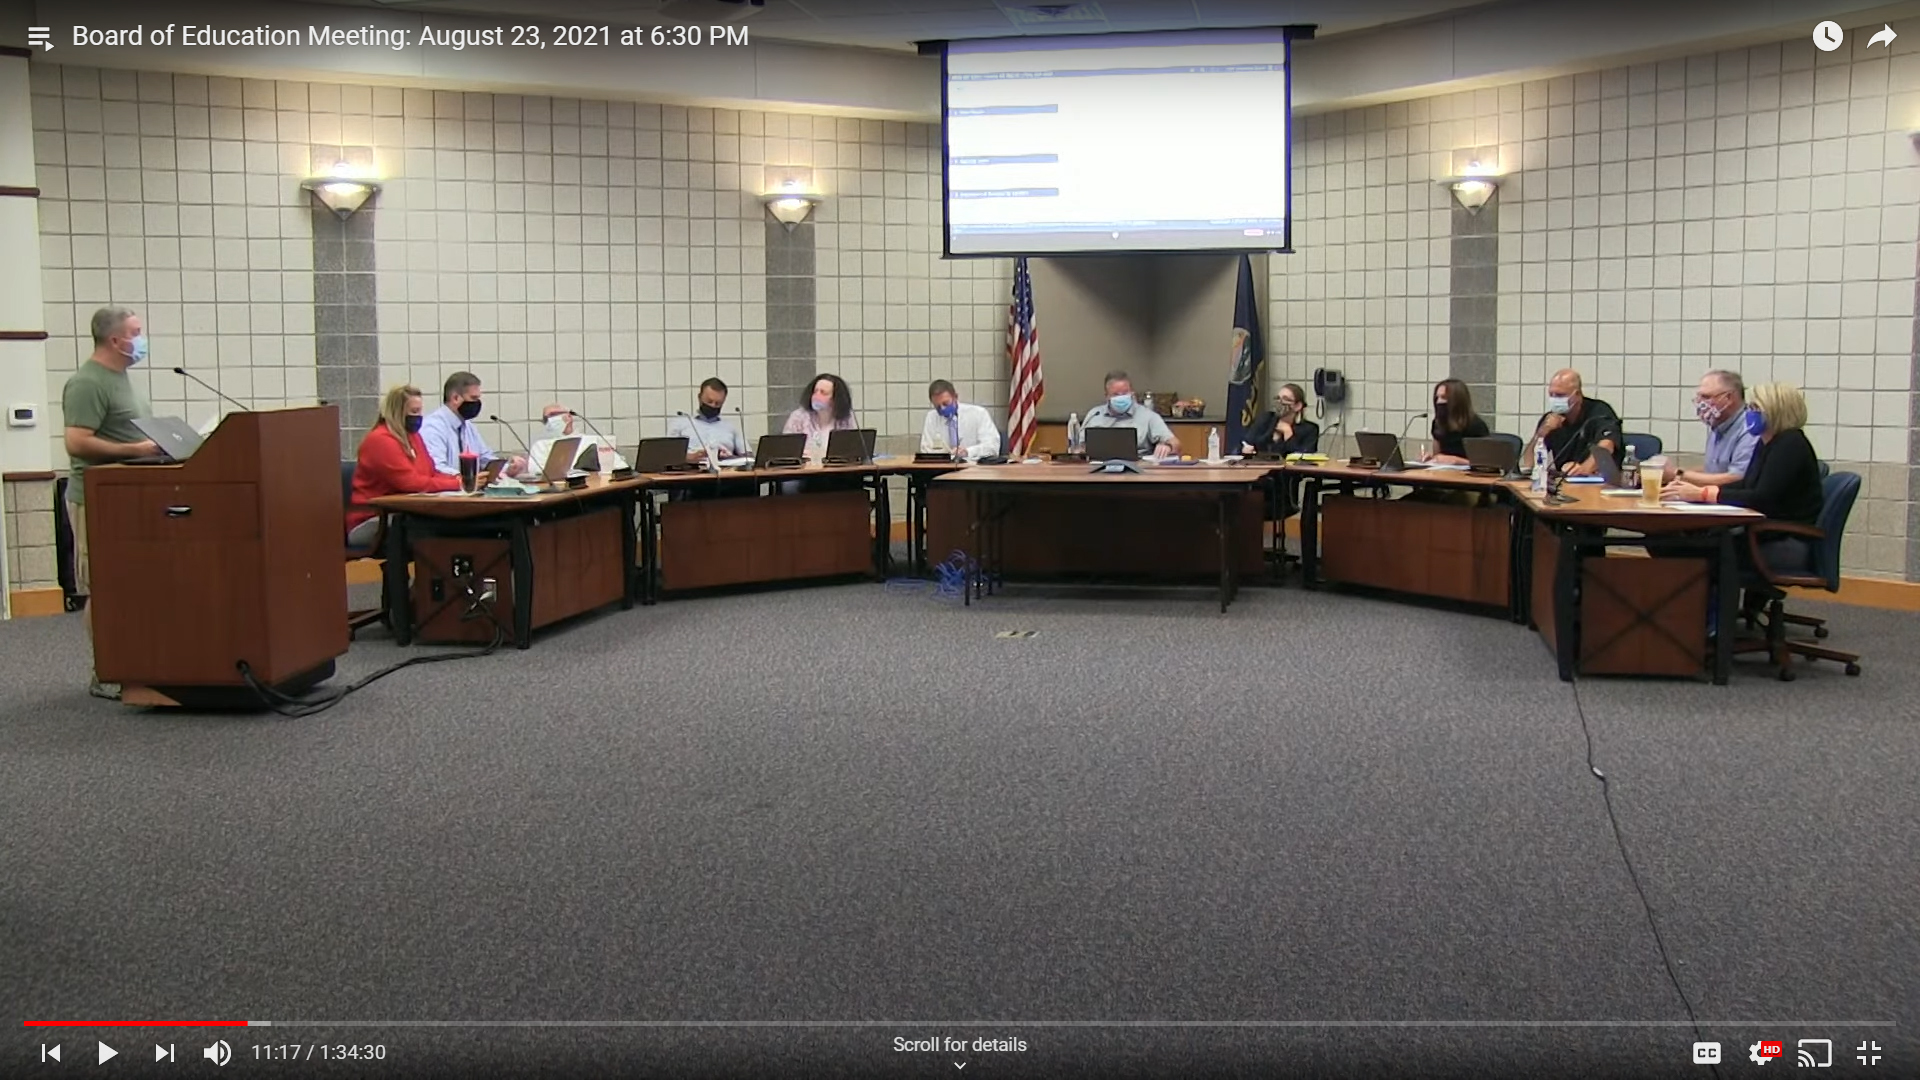 COVID-19 shines unexpected spotlight on Kansas school board members